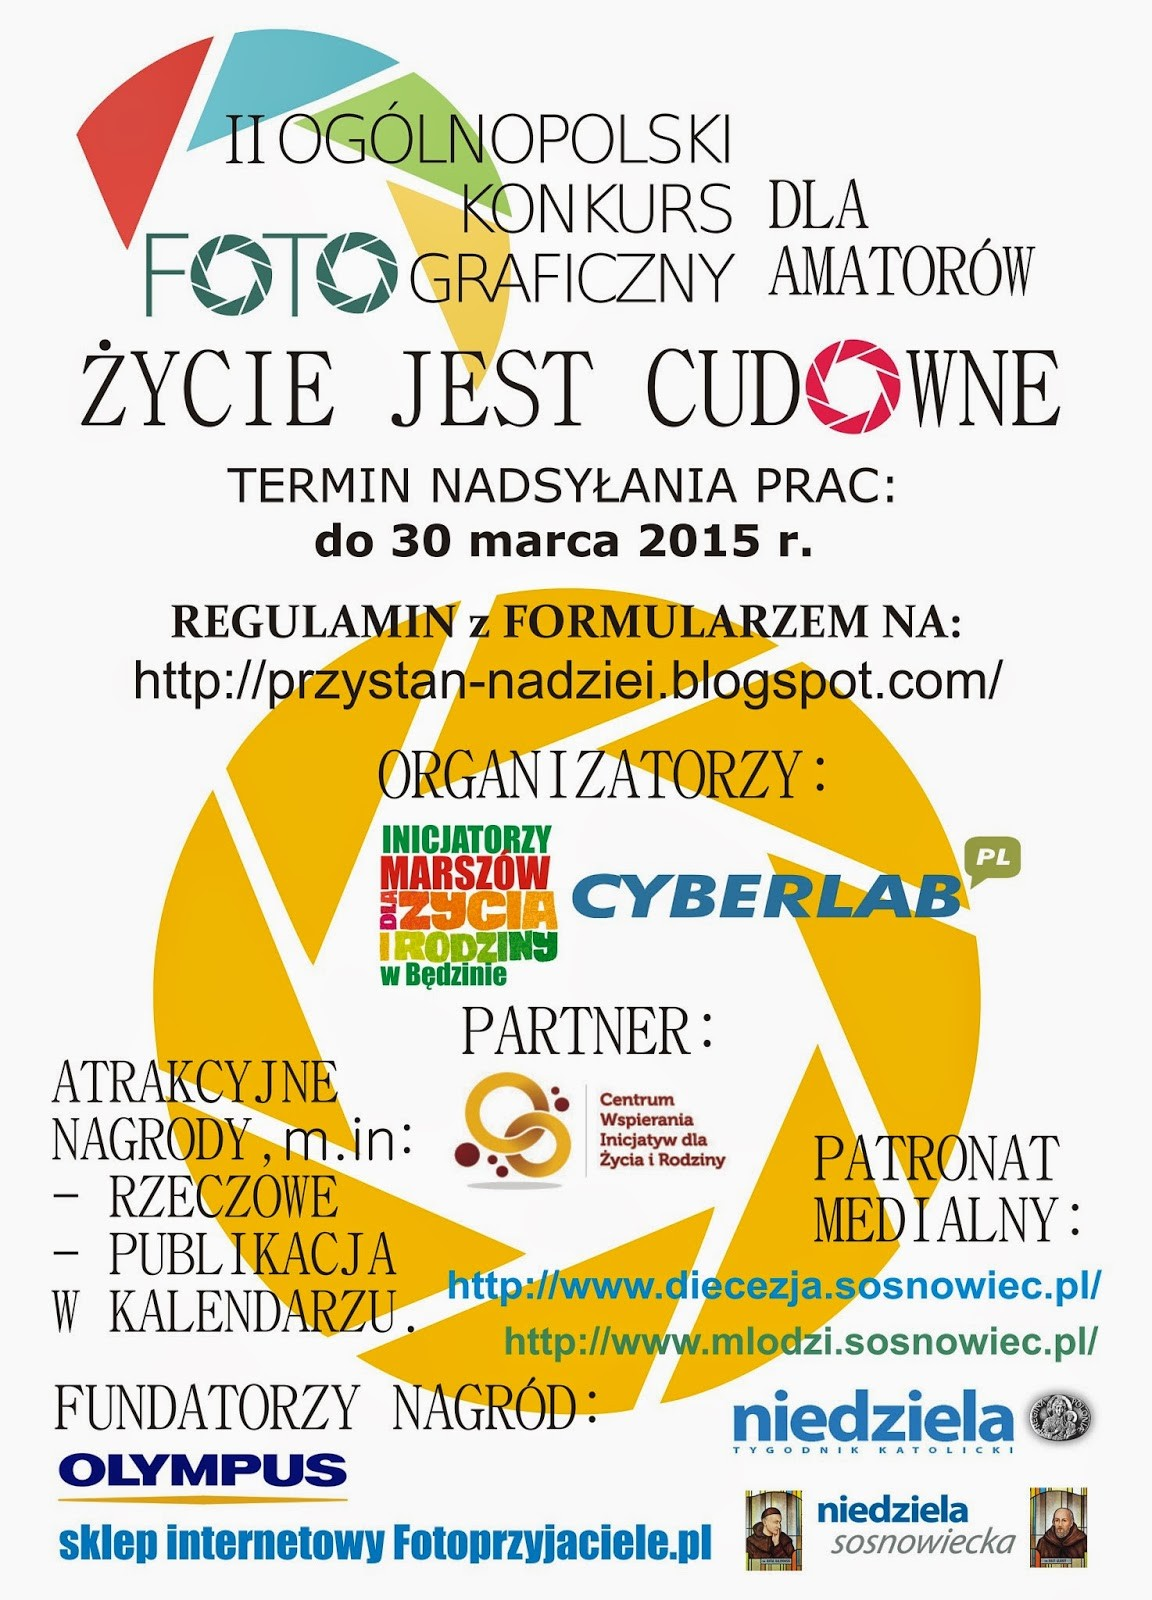 plakat II Ogolnopolski Konkurs Fotograficzny